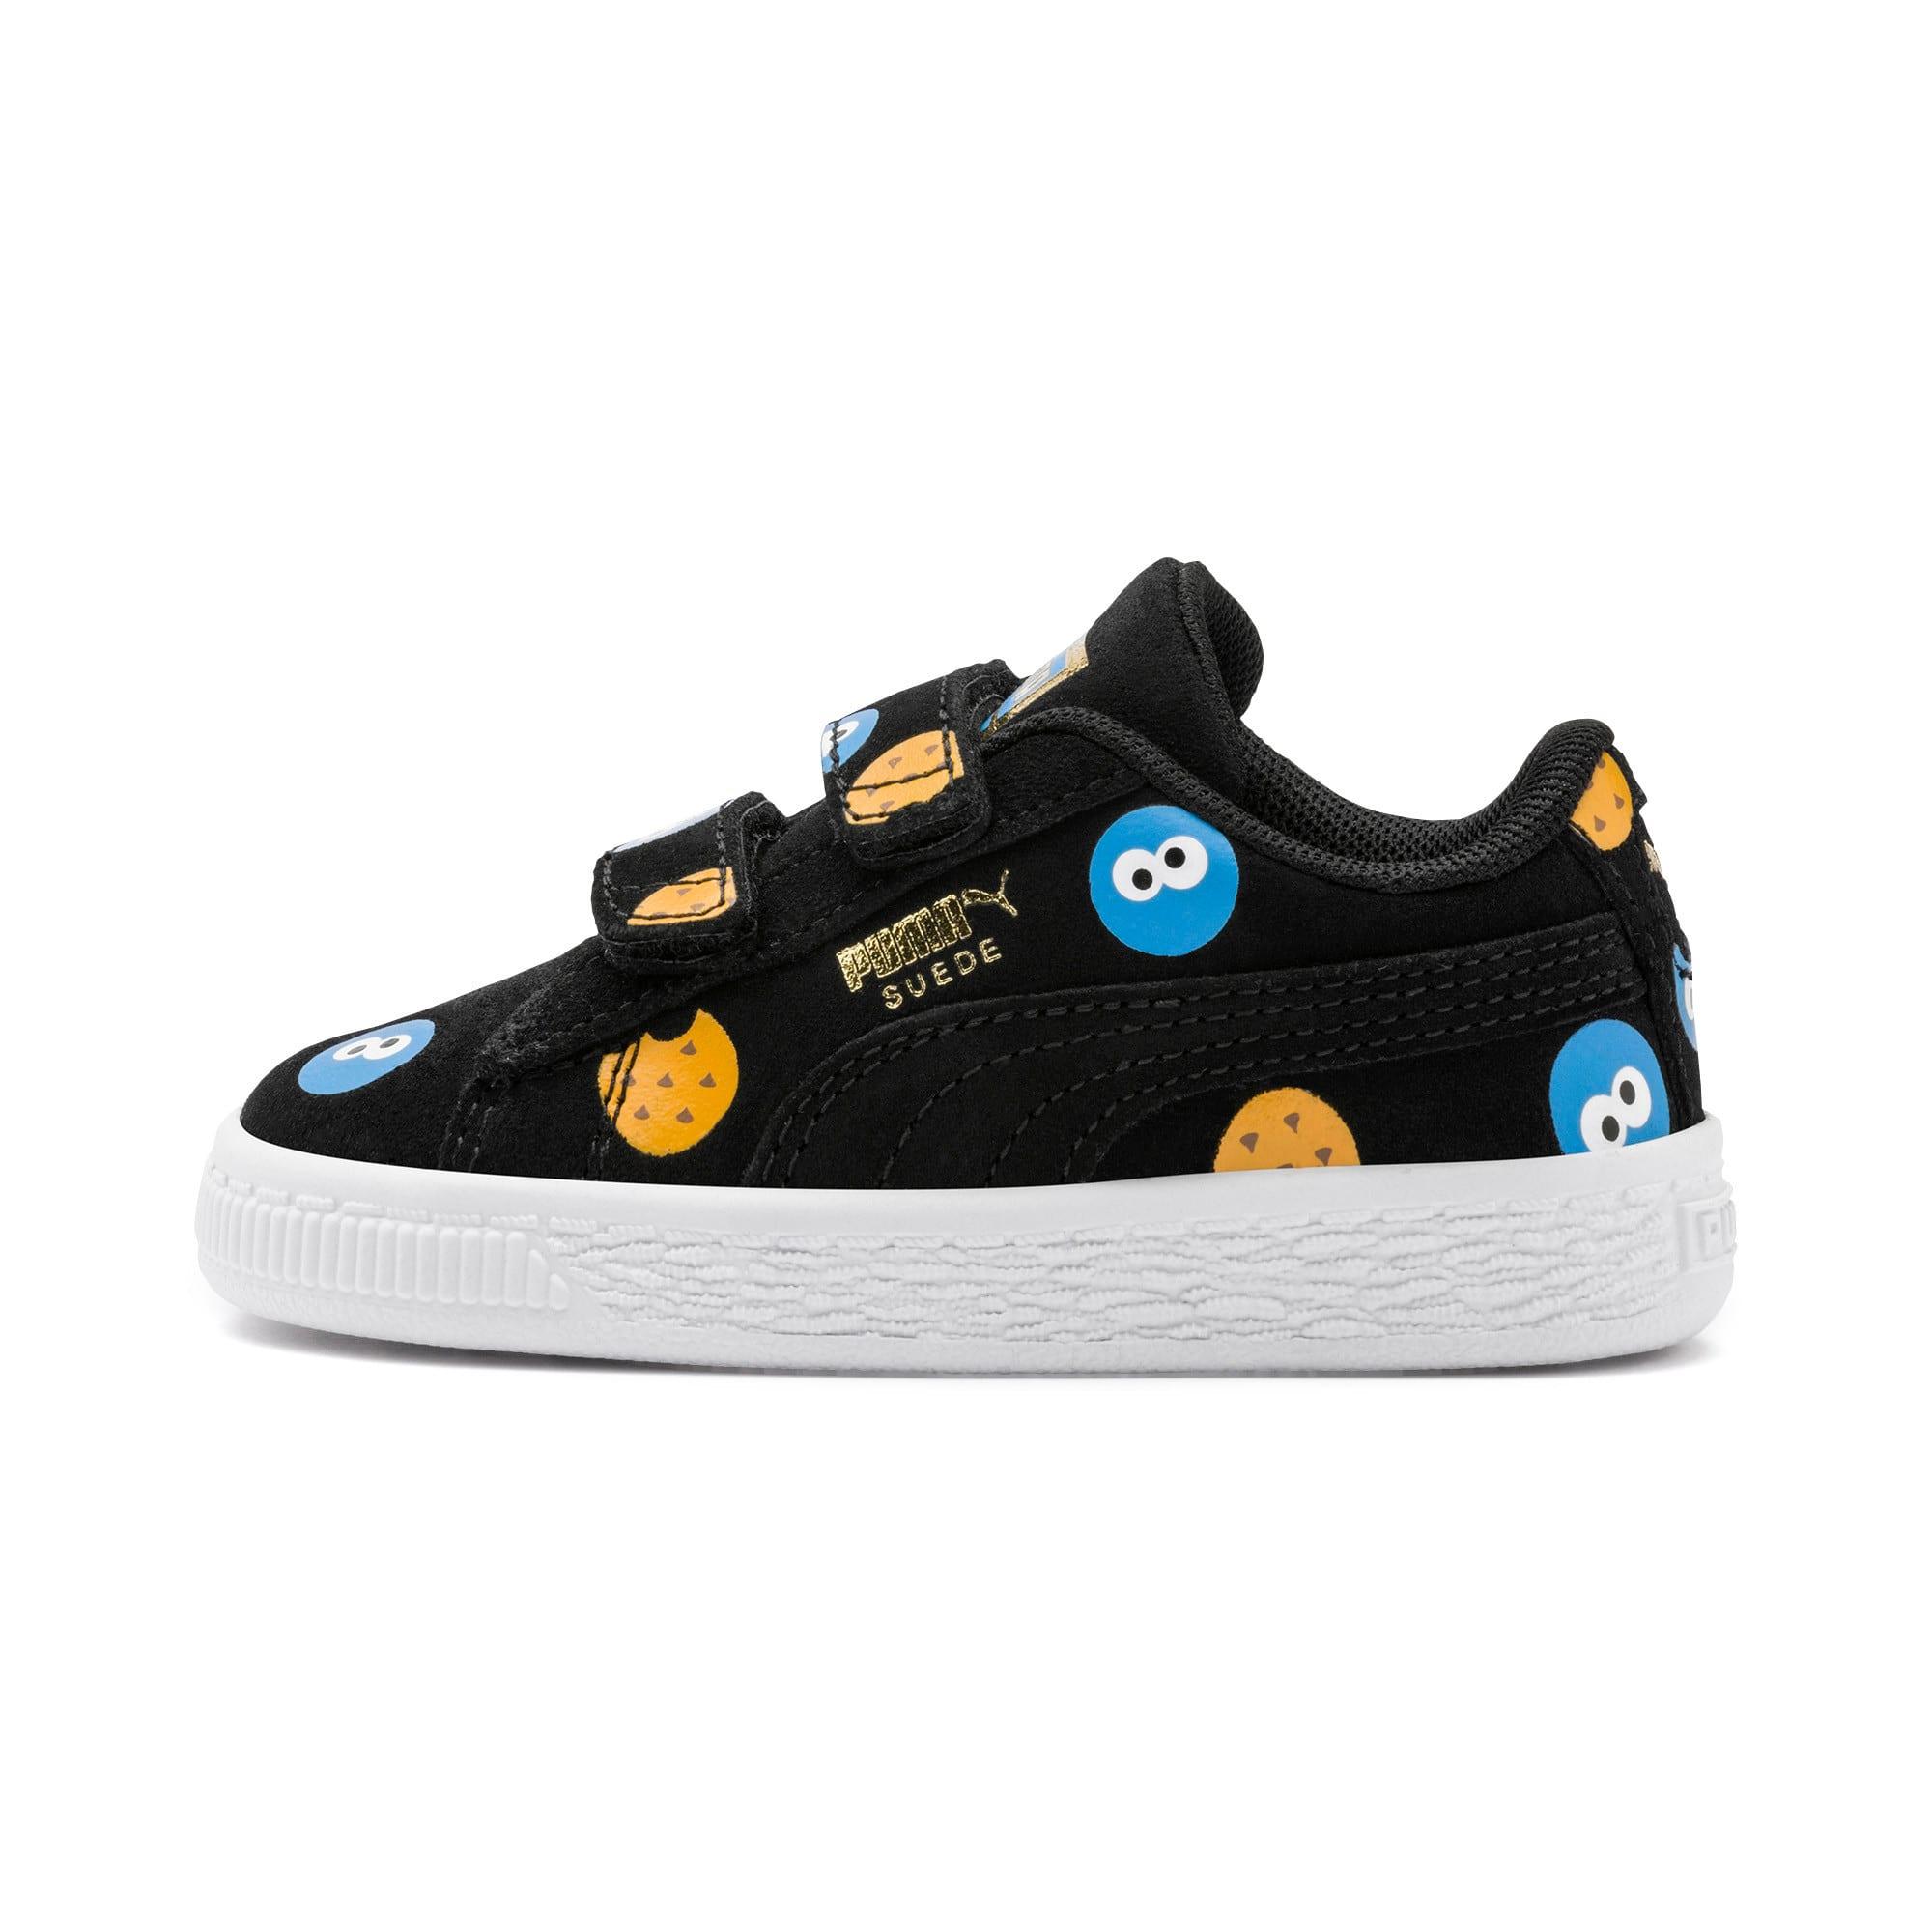 Thumbnail 1 of PUMA x SESAME STREET 50 Suede Badge Toddler Shoes, Puma Black-Bleu Azur, medium